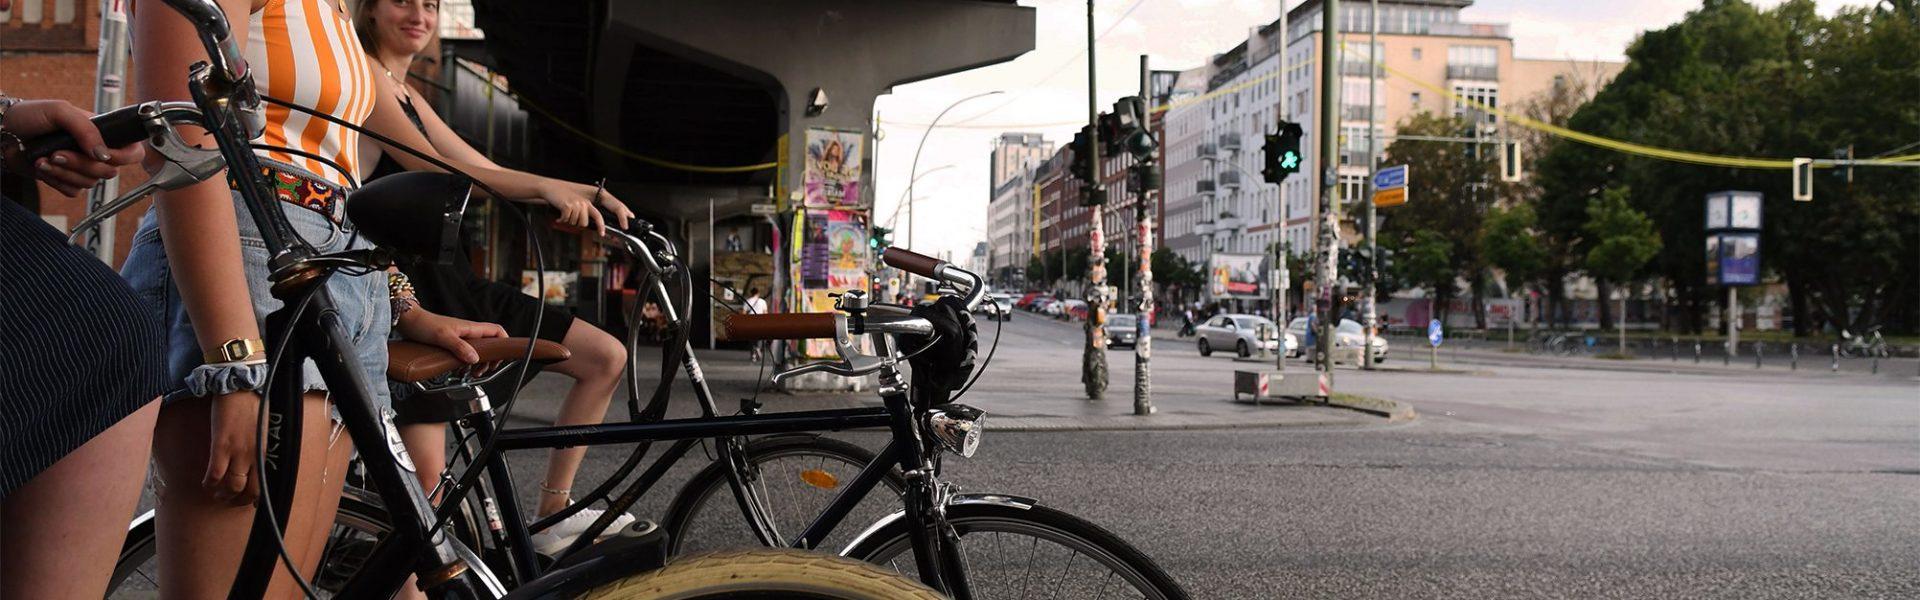 Berlin berlin student city new aspect ratio 2004 1167